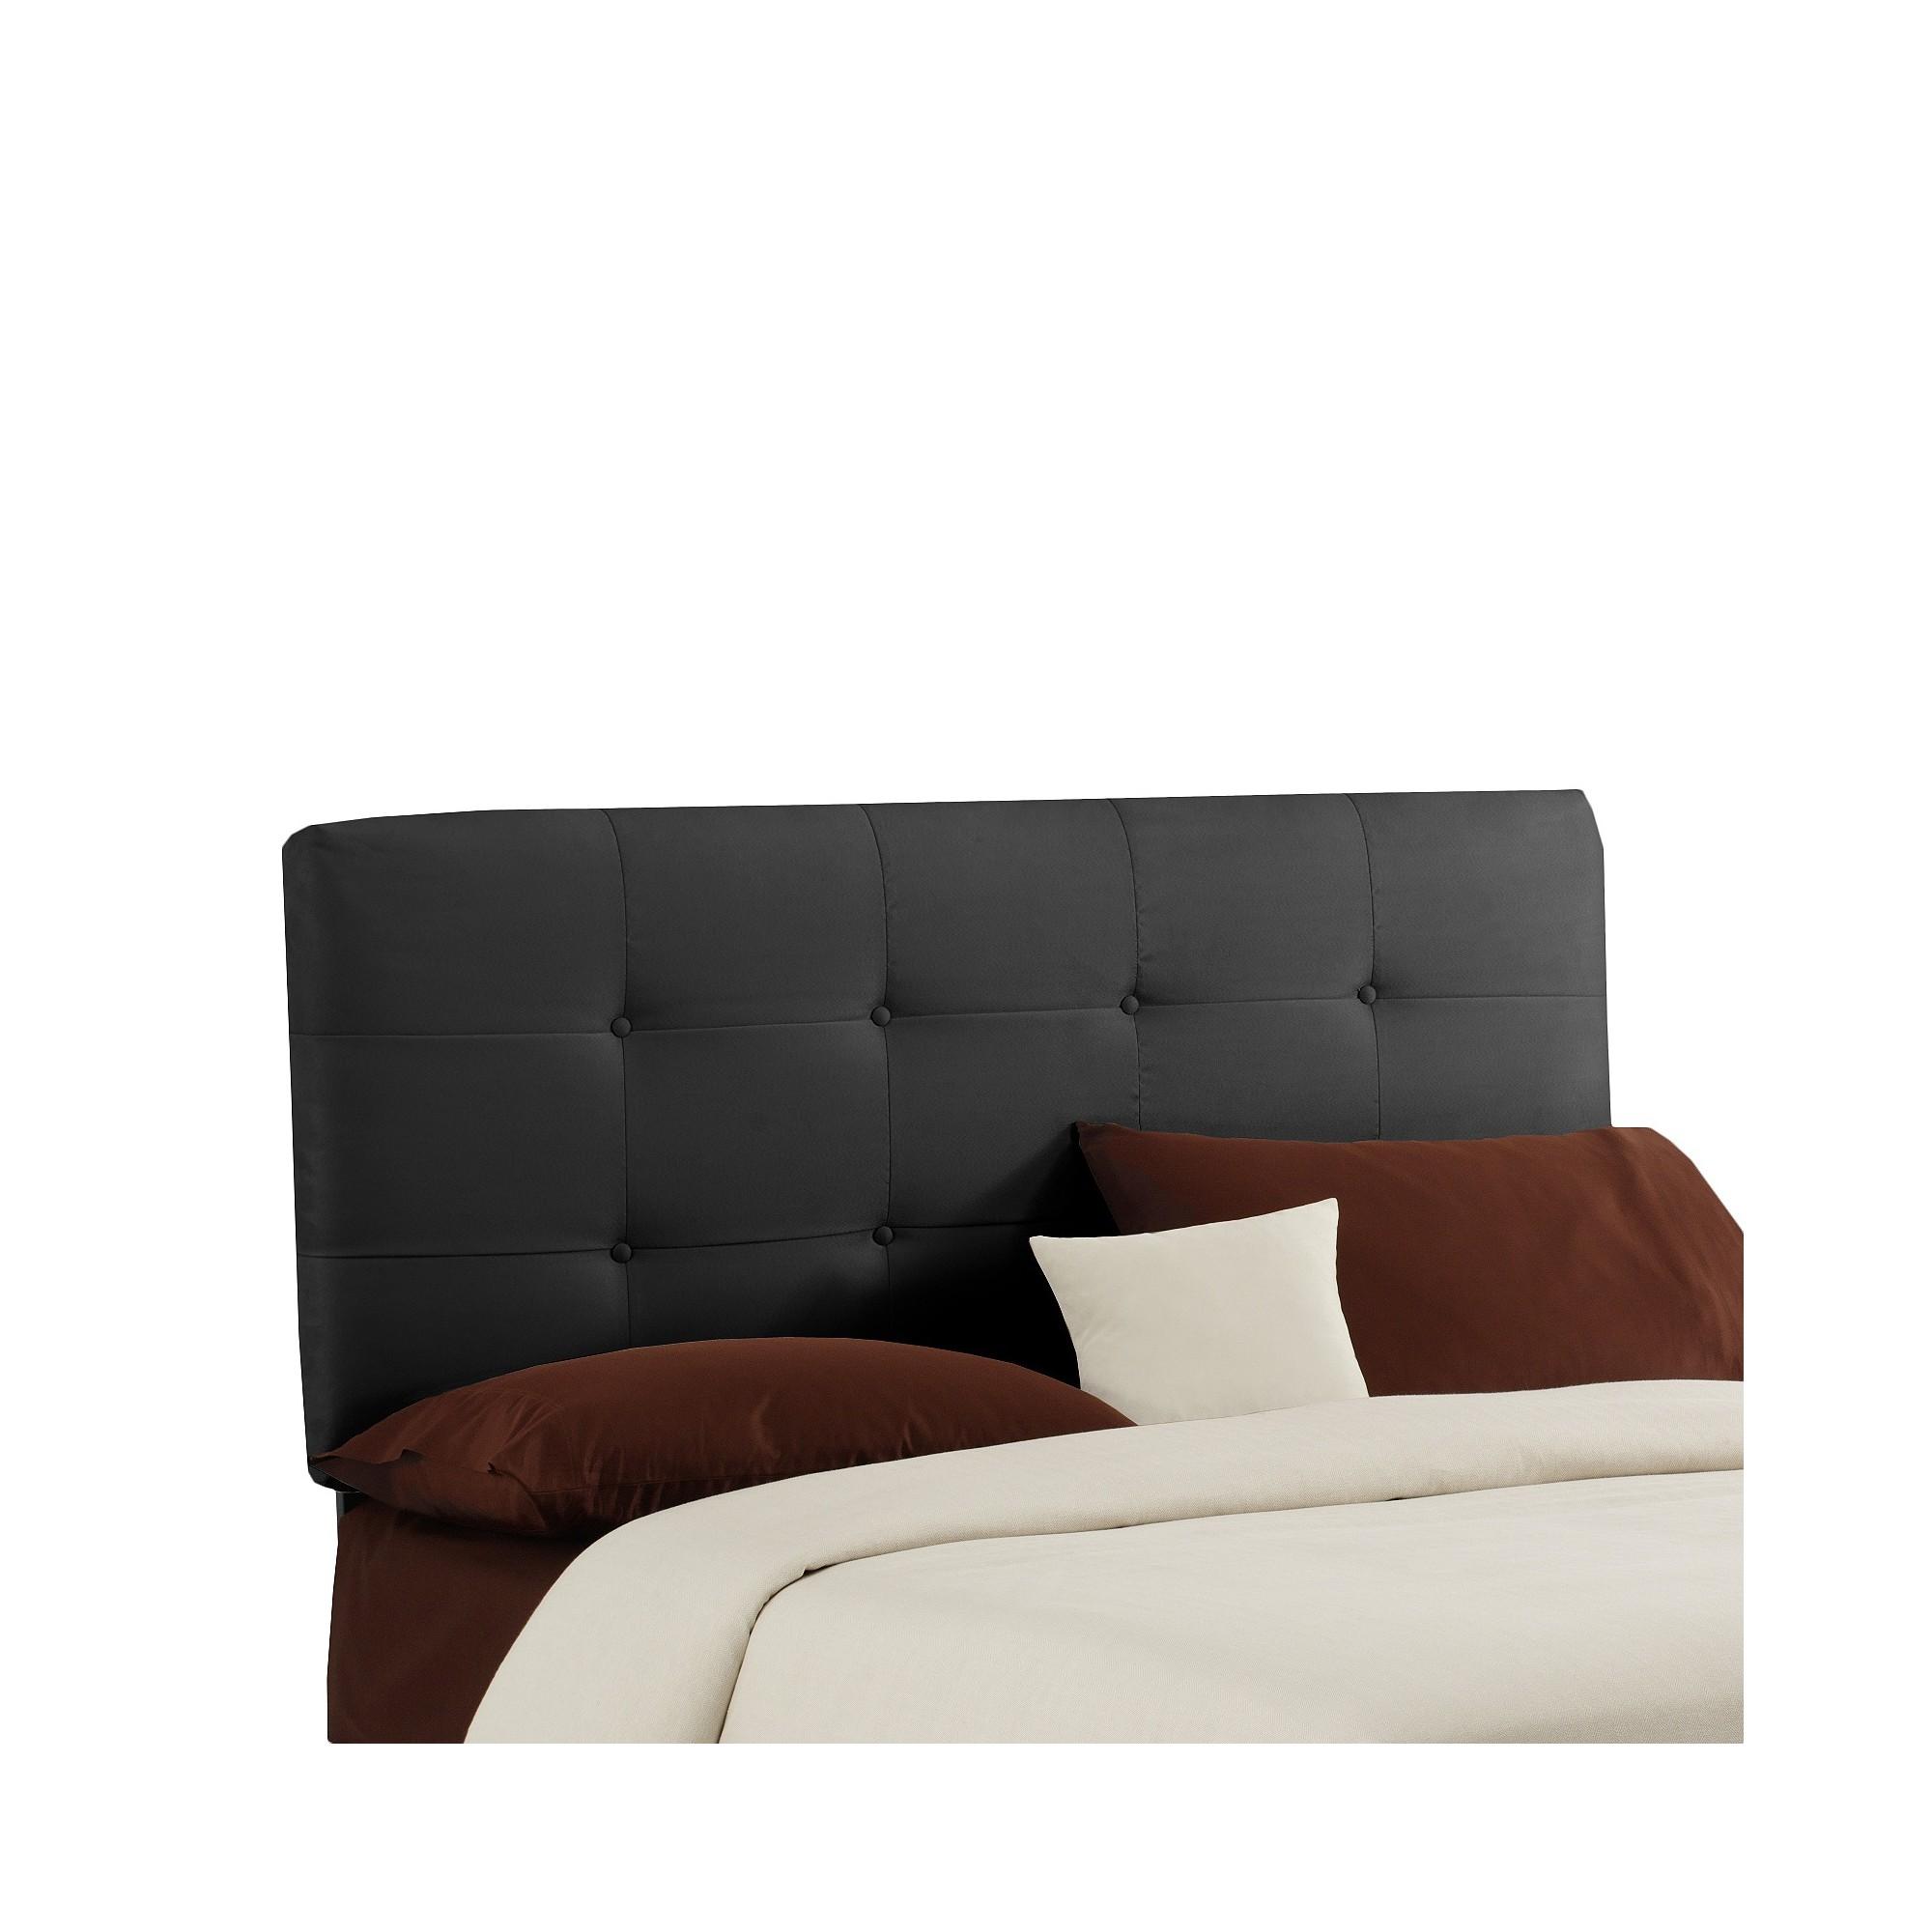 Dolce Microsuede Headboard - Premier Black - Full - Skyline Furniture